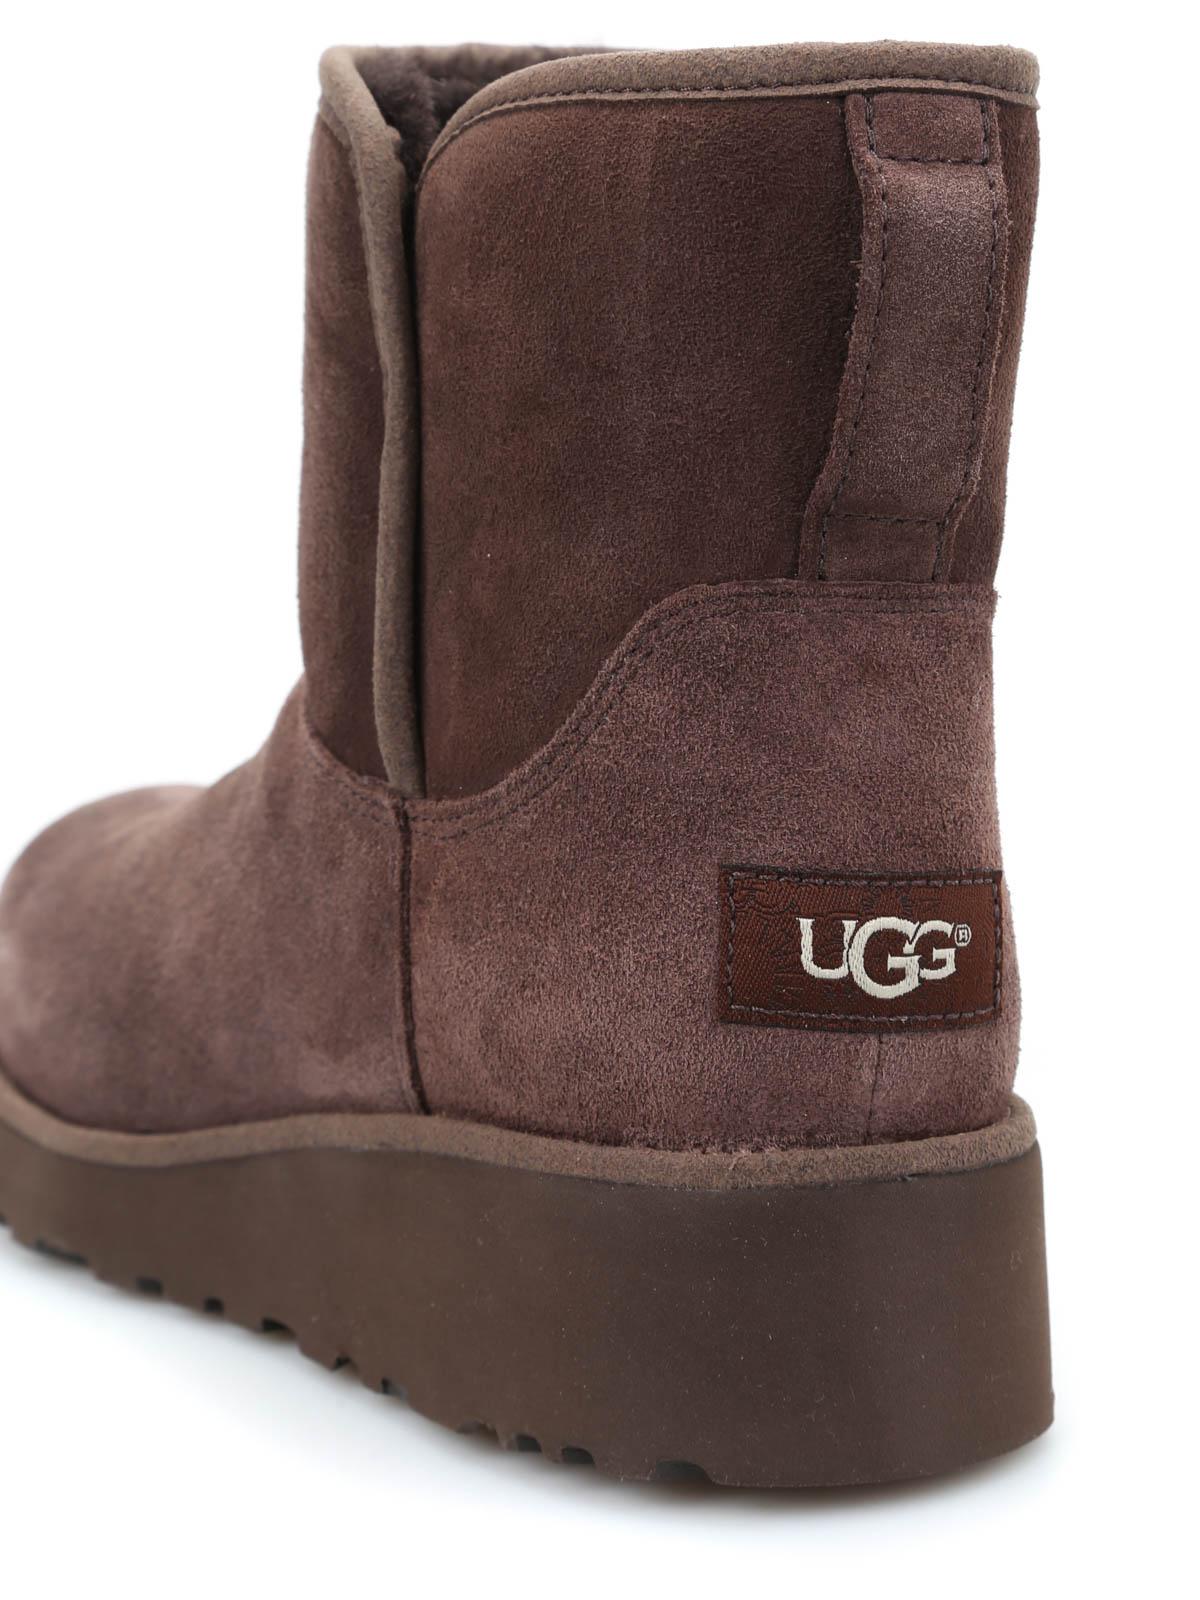 Ugg Kristin Sheepskin Booties Ankle Boots 1012496w